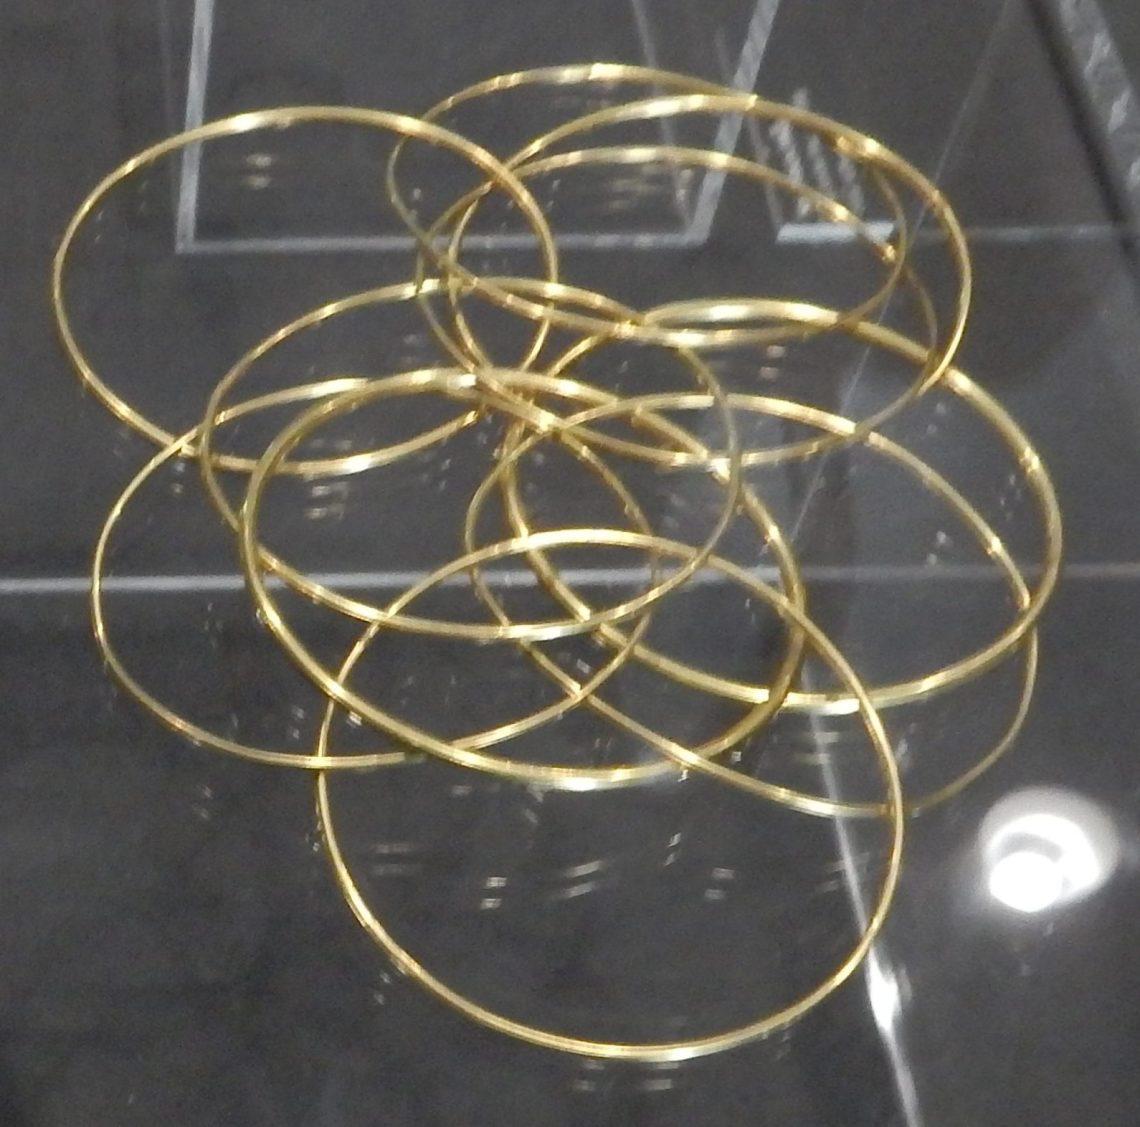 Sofie Lachaert, Circles, armband, 1997. Show yourself, Design Museum Den Bosch, 2018, Collectie Yvònne Joris. Collectie DMDB, S2018.243. Foto Esther Doornbusch, 28 augustus 2018, CC BY 4.0